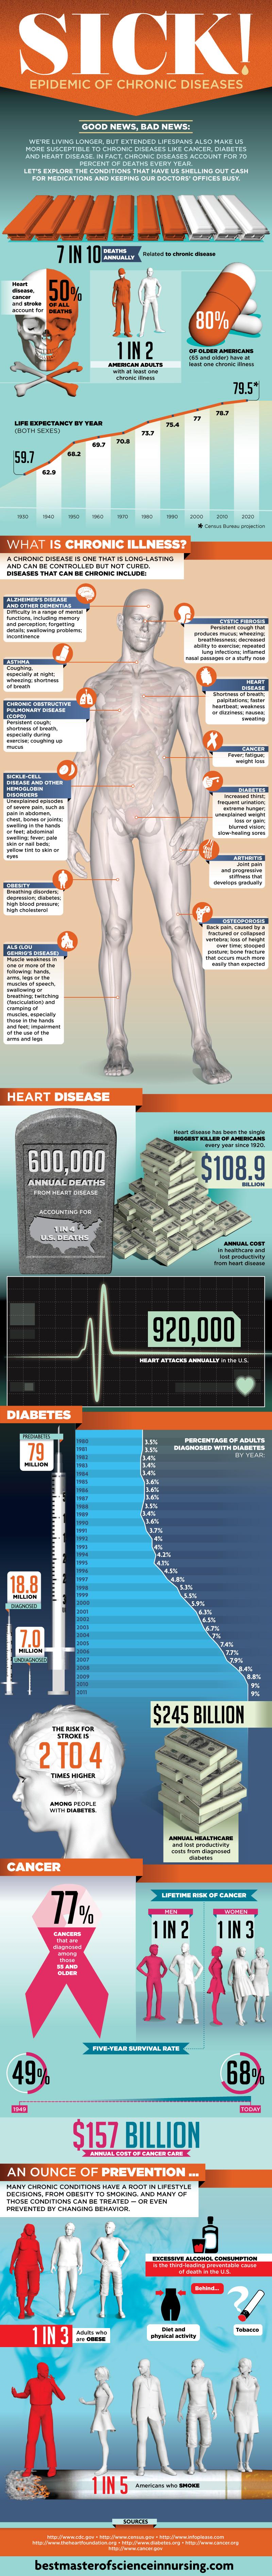 Sick! Epidemic of Chronic Diseases